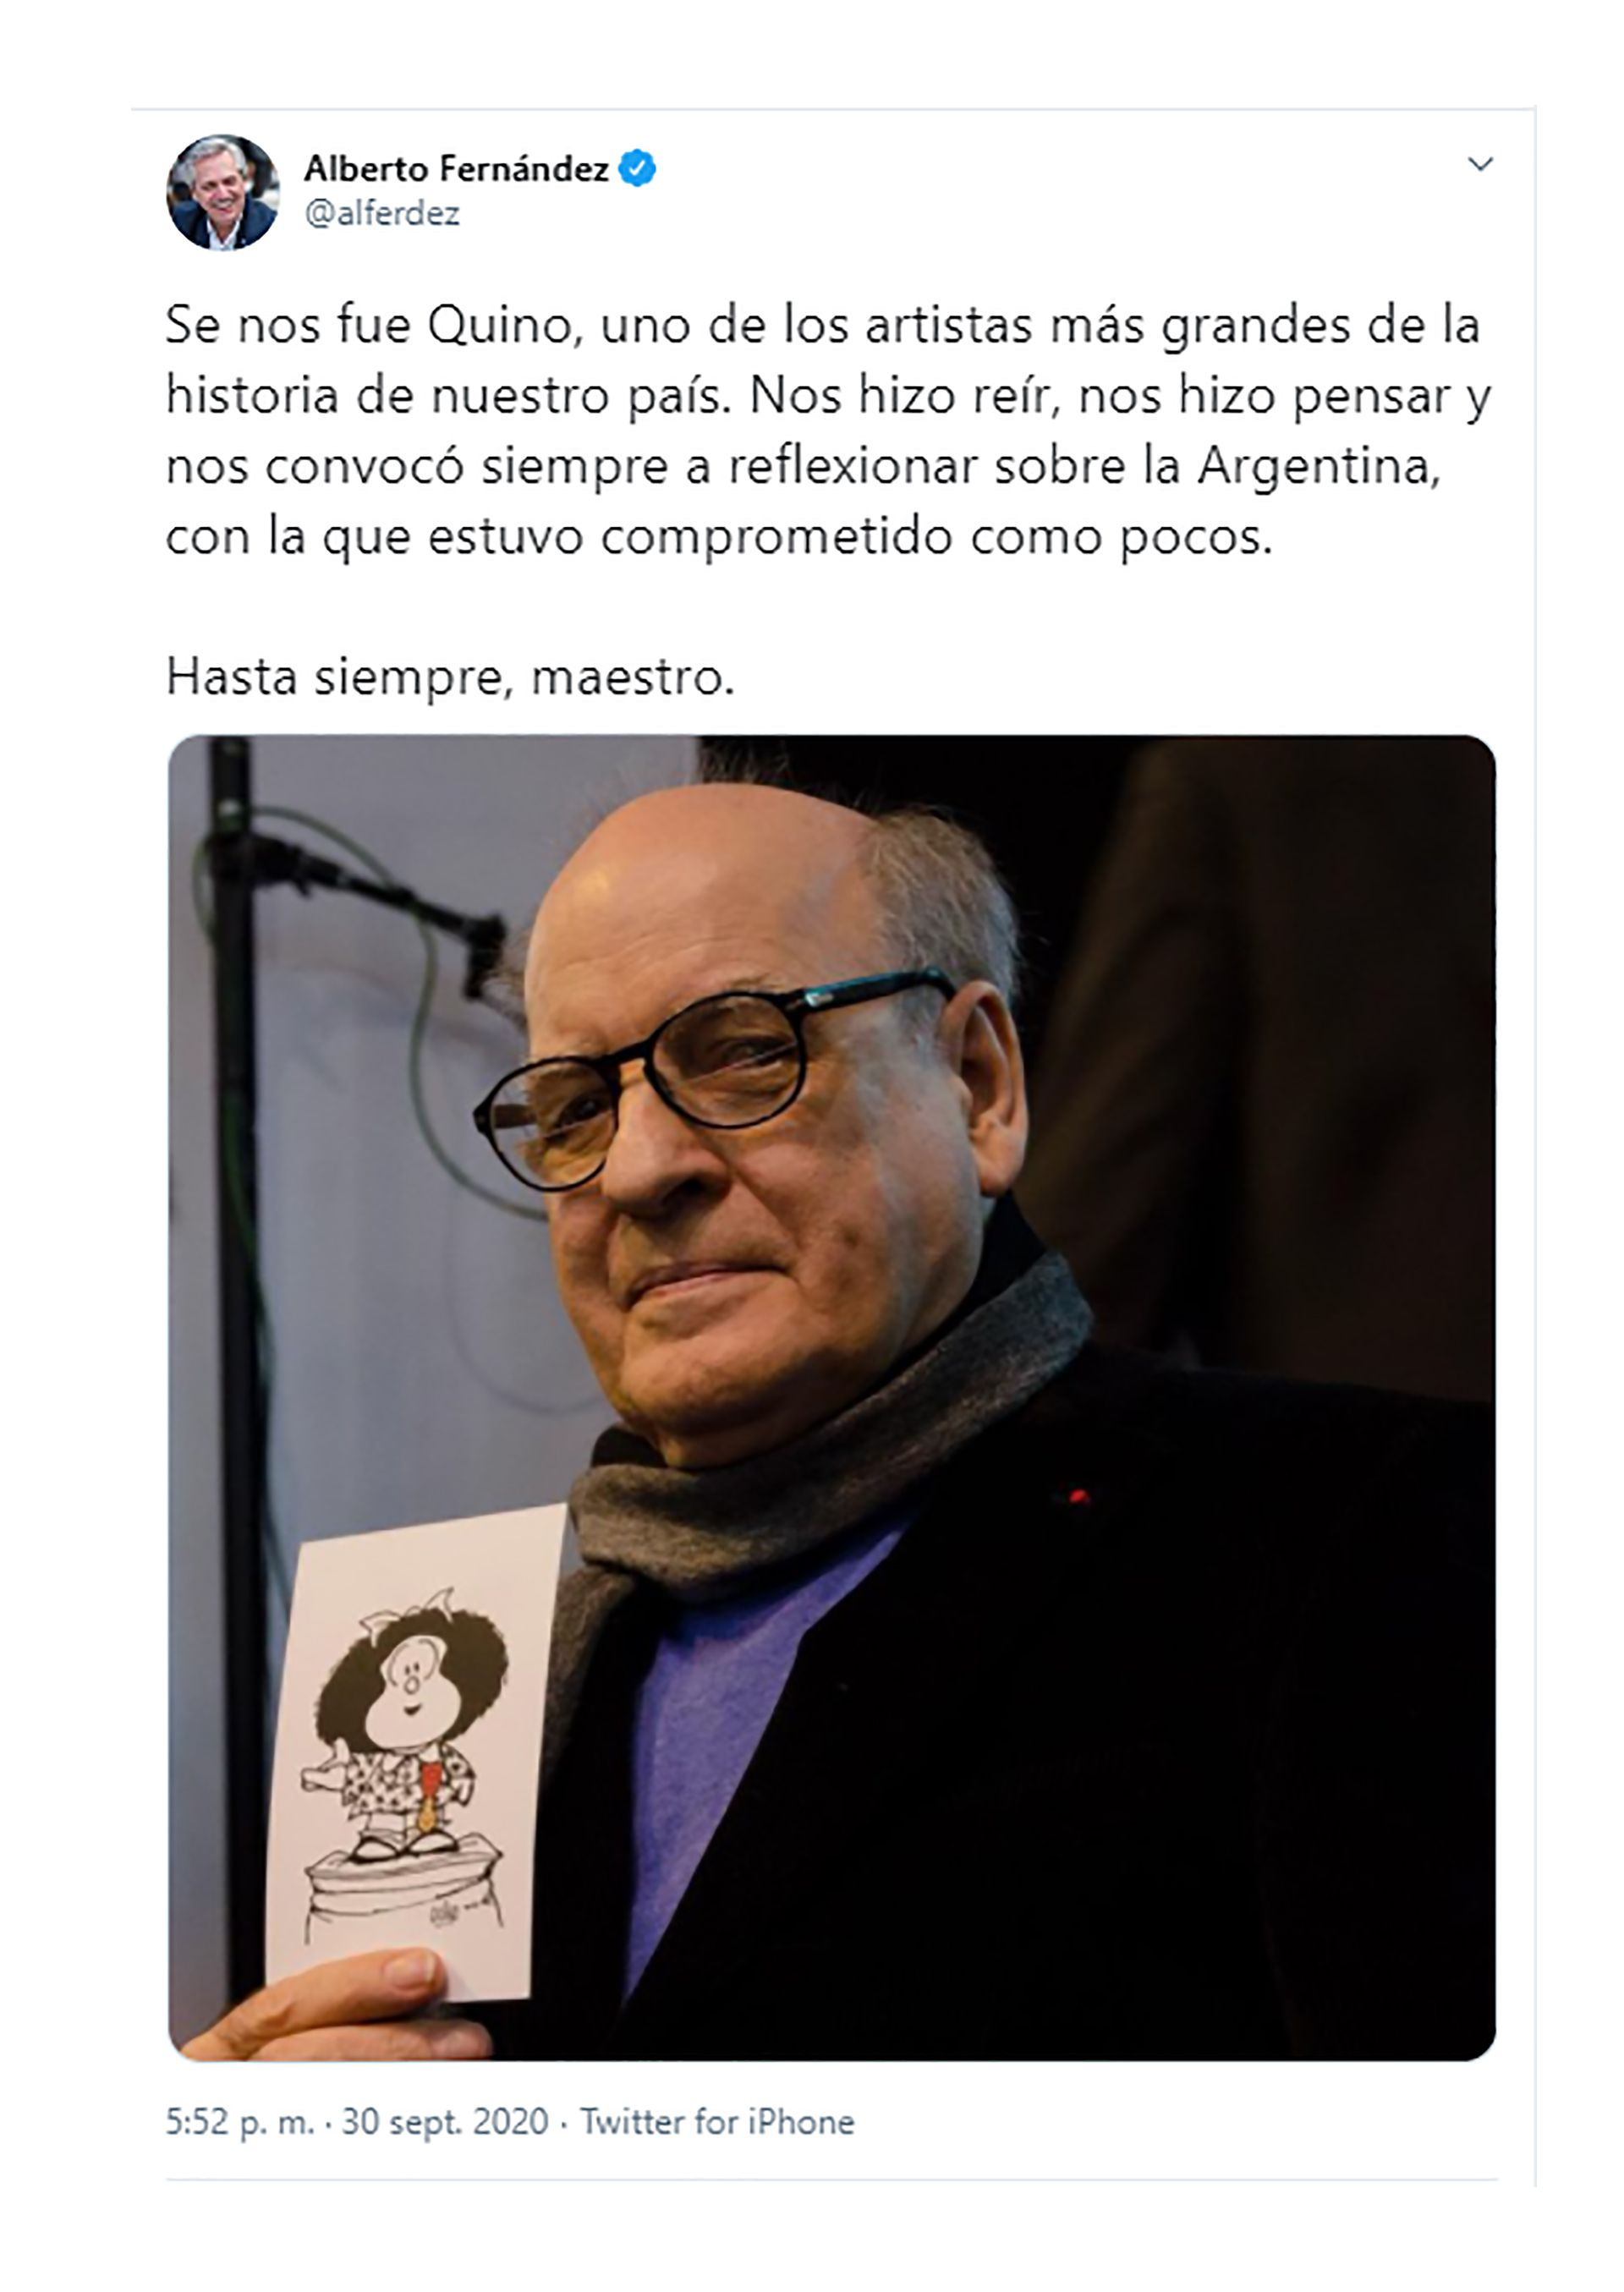 Alberto Fernández Quino